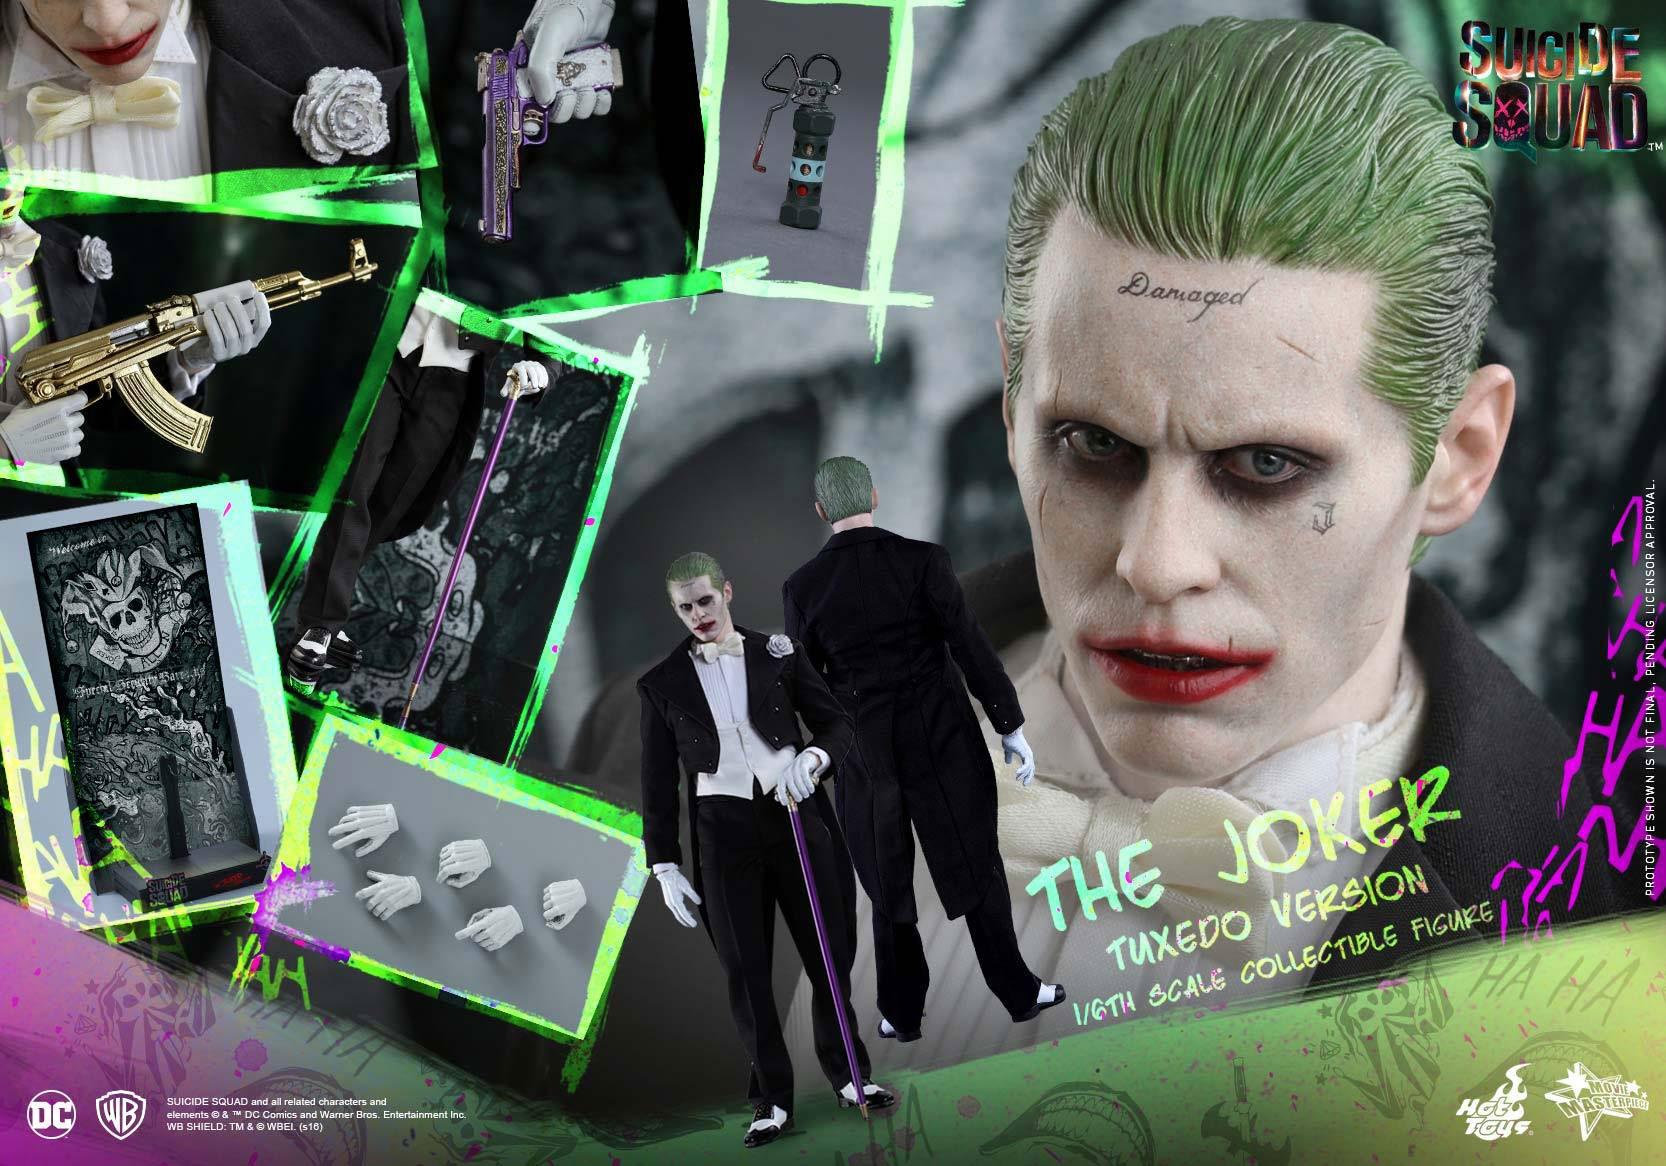 suicide-squad-hot-toys-joker-tuxedo-figure-6